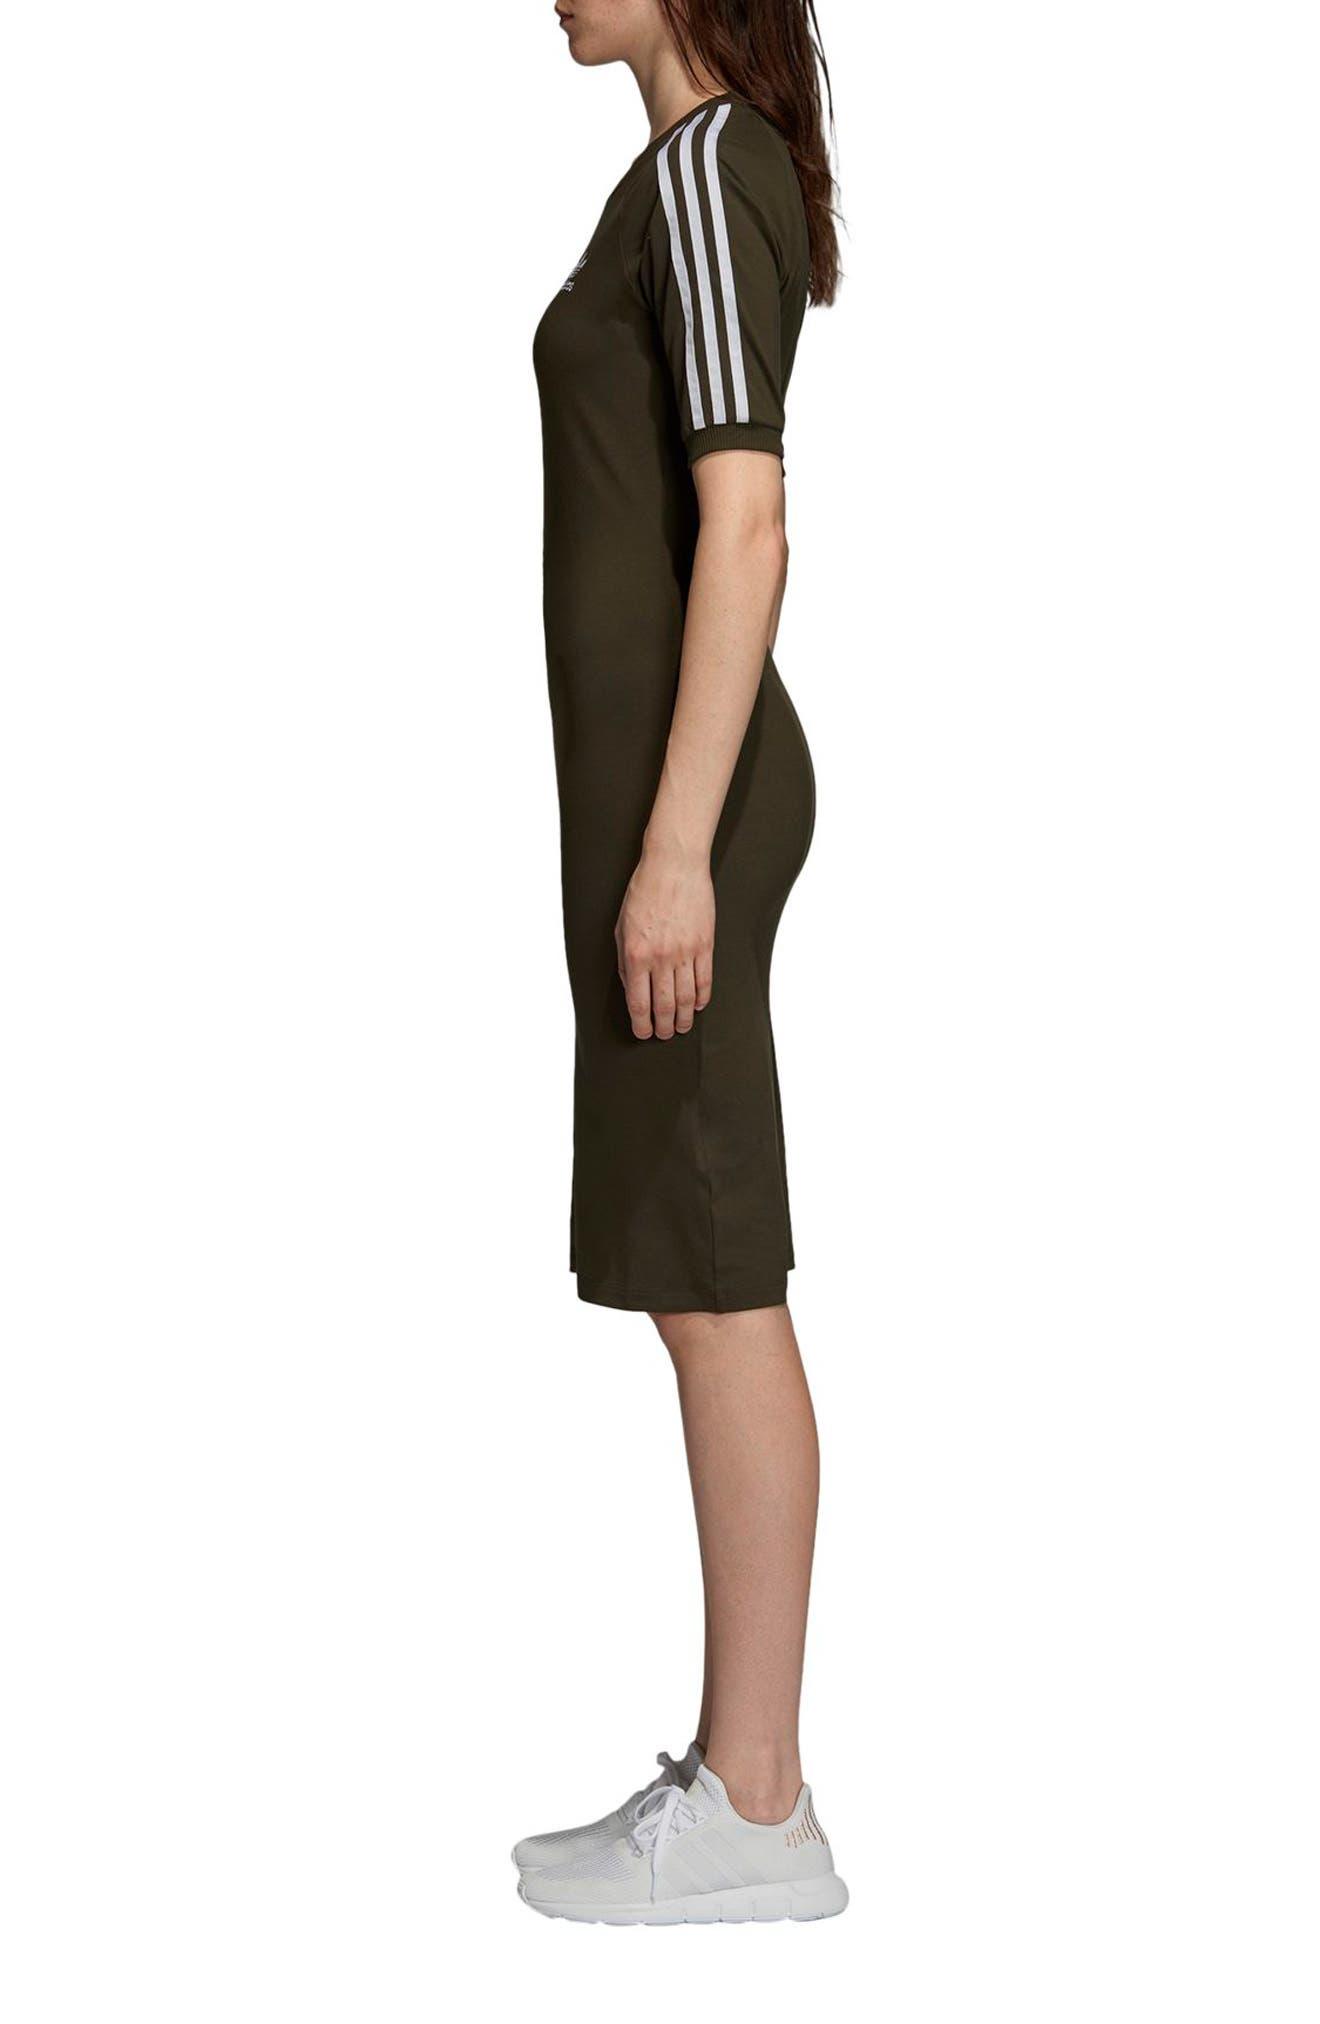 adidas 3-Stripes Dress,                             Alternate thumbnail 3, color,                             NIGHT CARGO